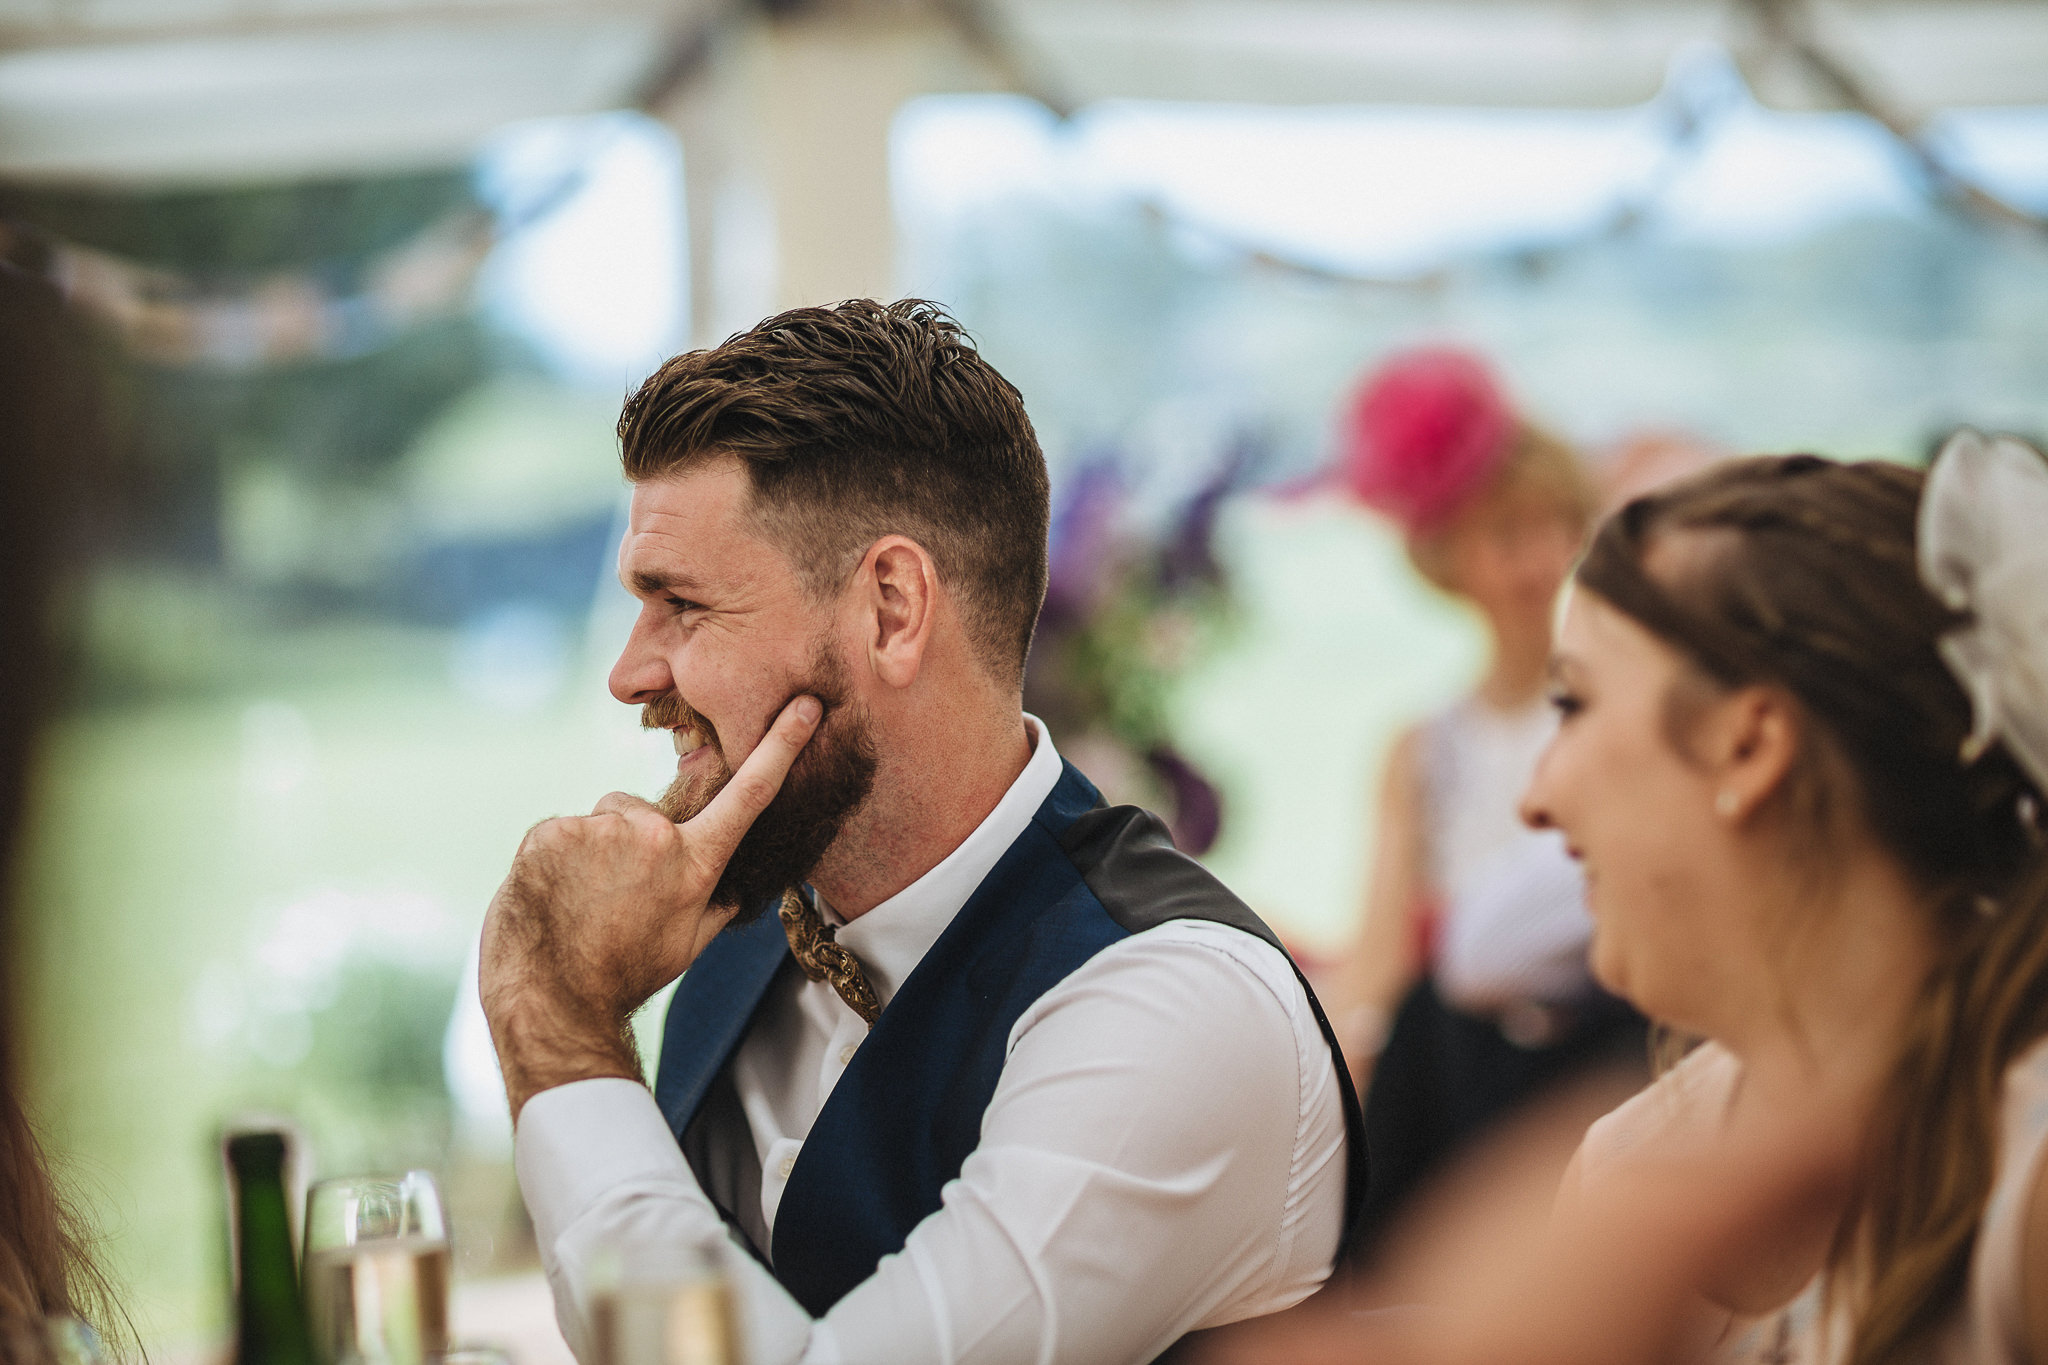 paul-marbrook-Farm-Wedding-Photographer-Lancashire-90056